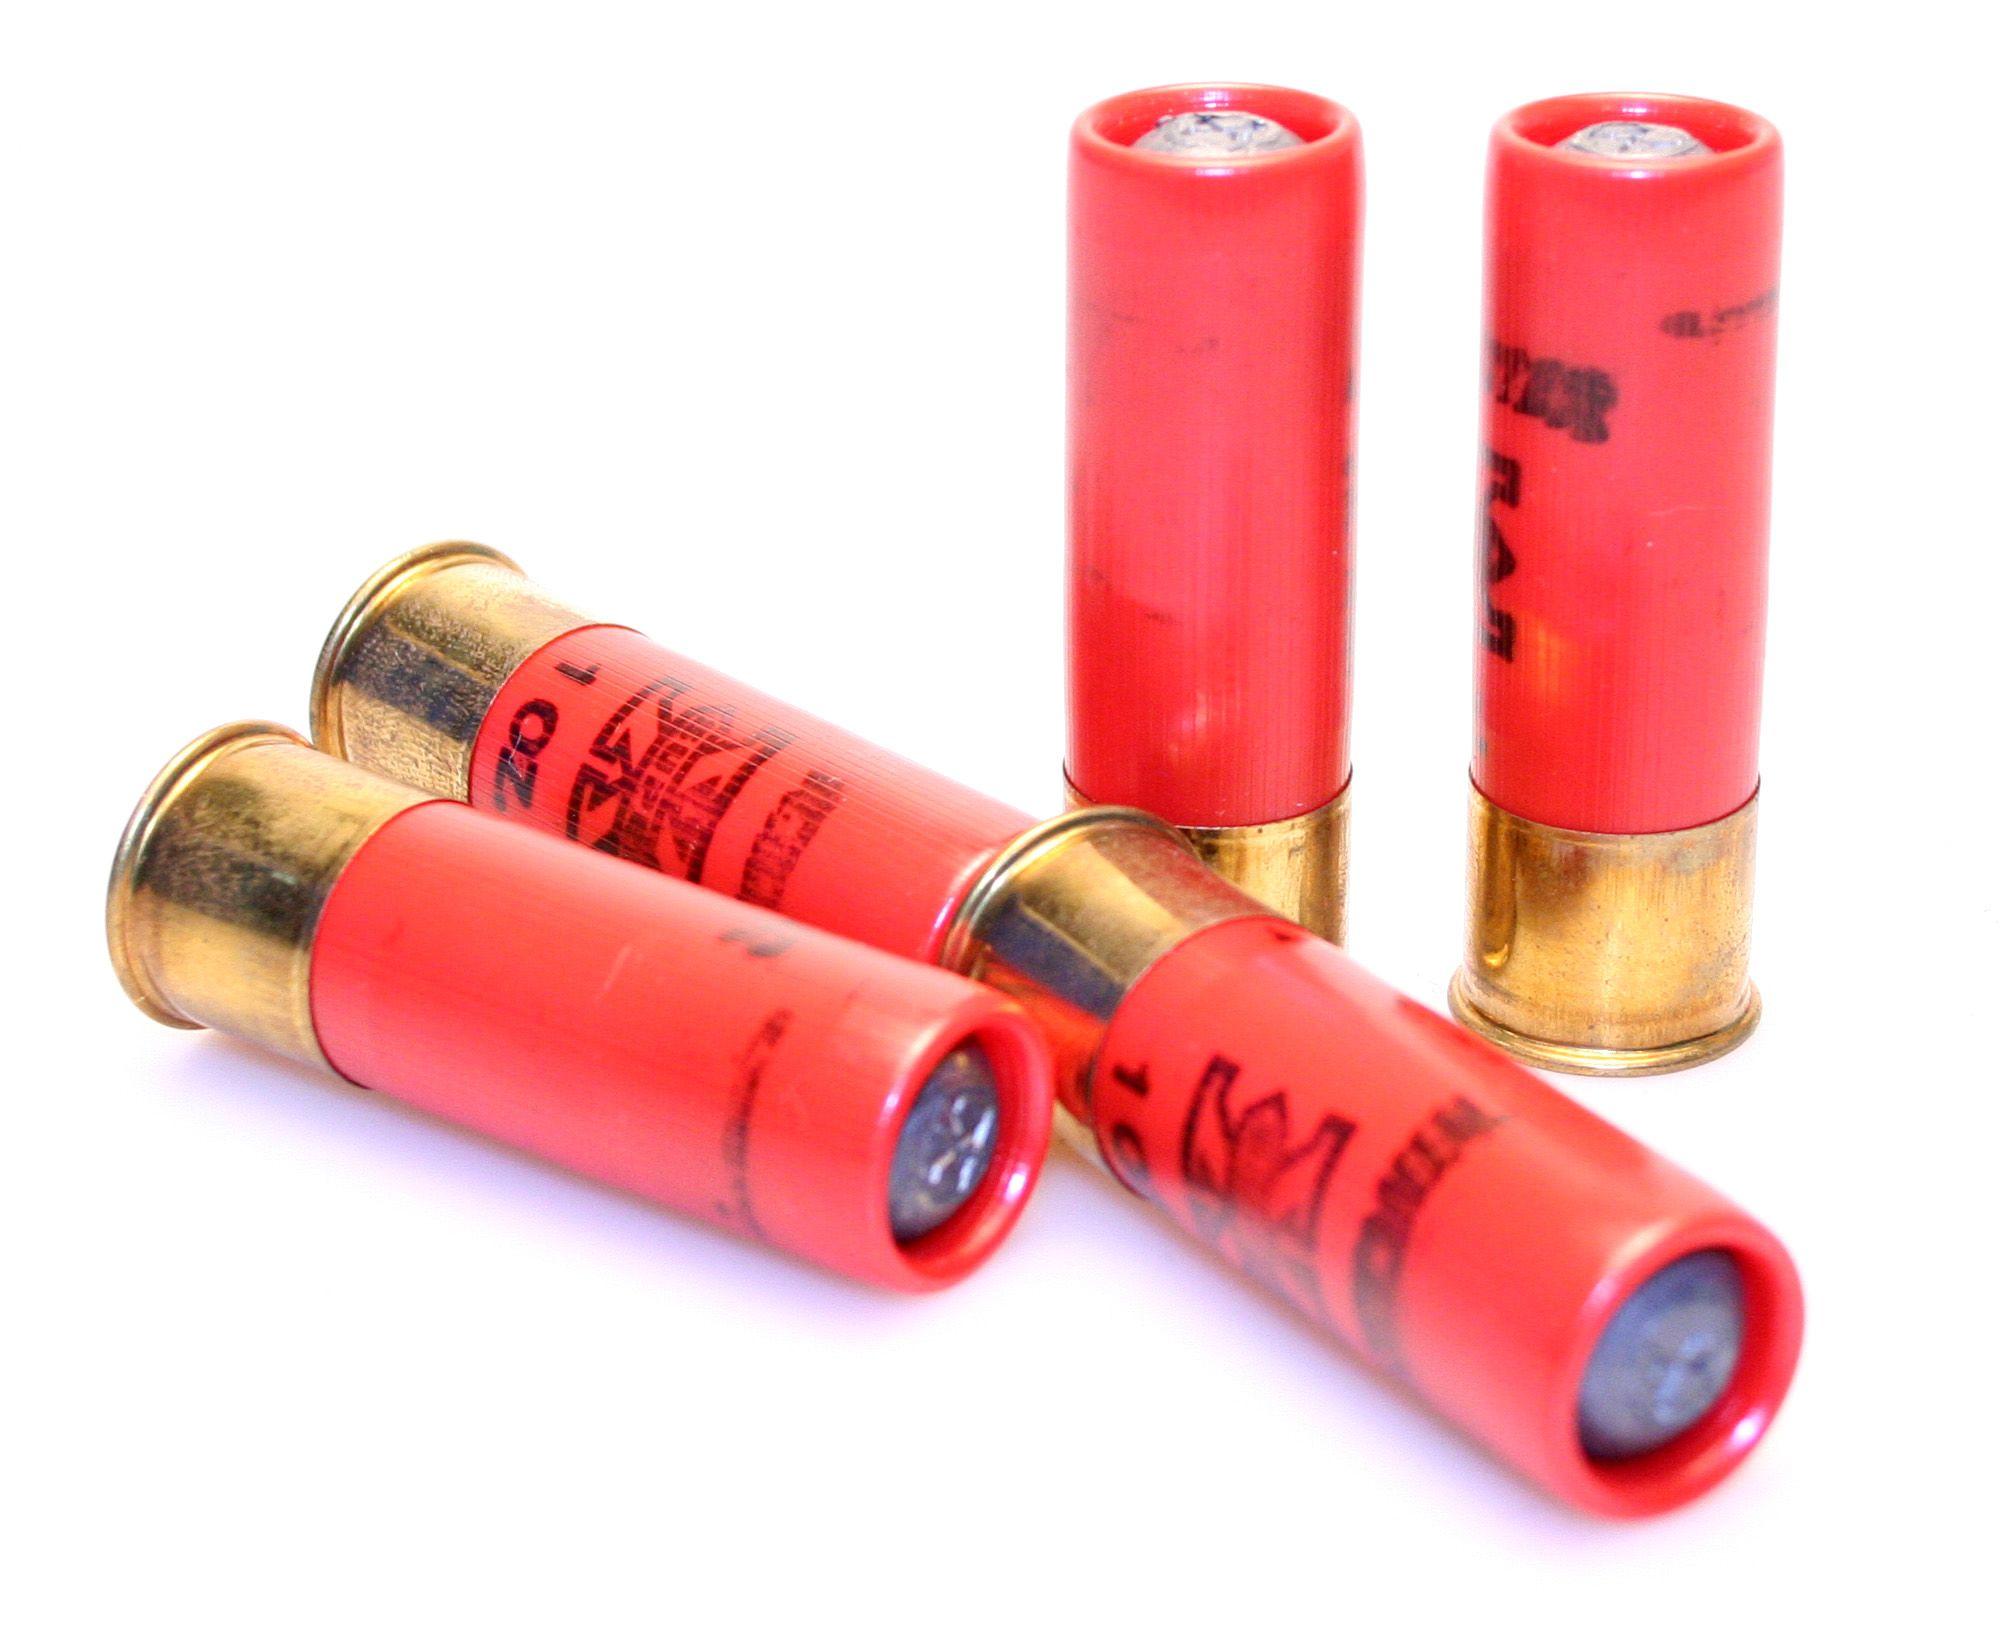 shotgun cartigas (ammo) that is needed in order to use a shotgun.